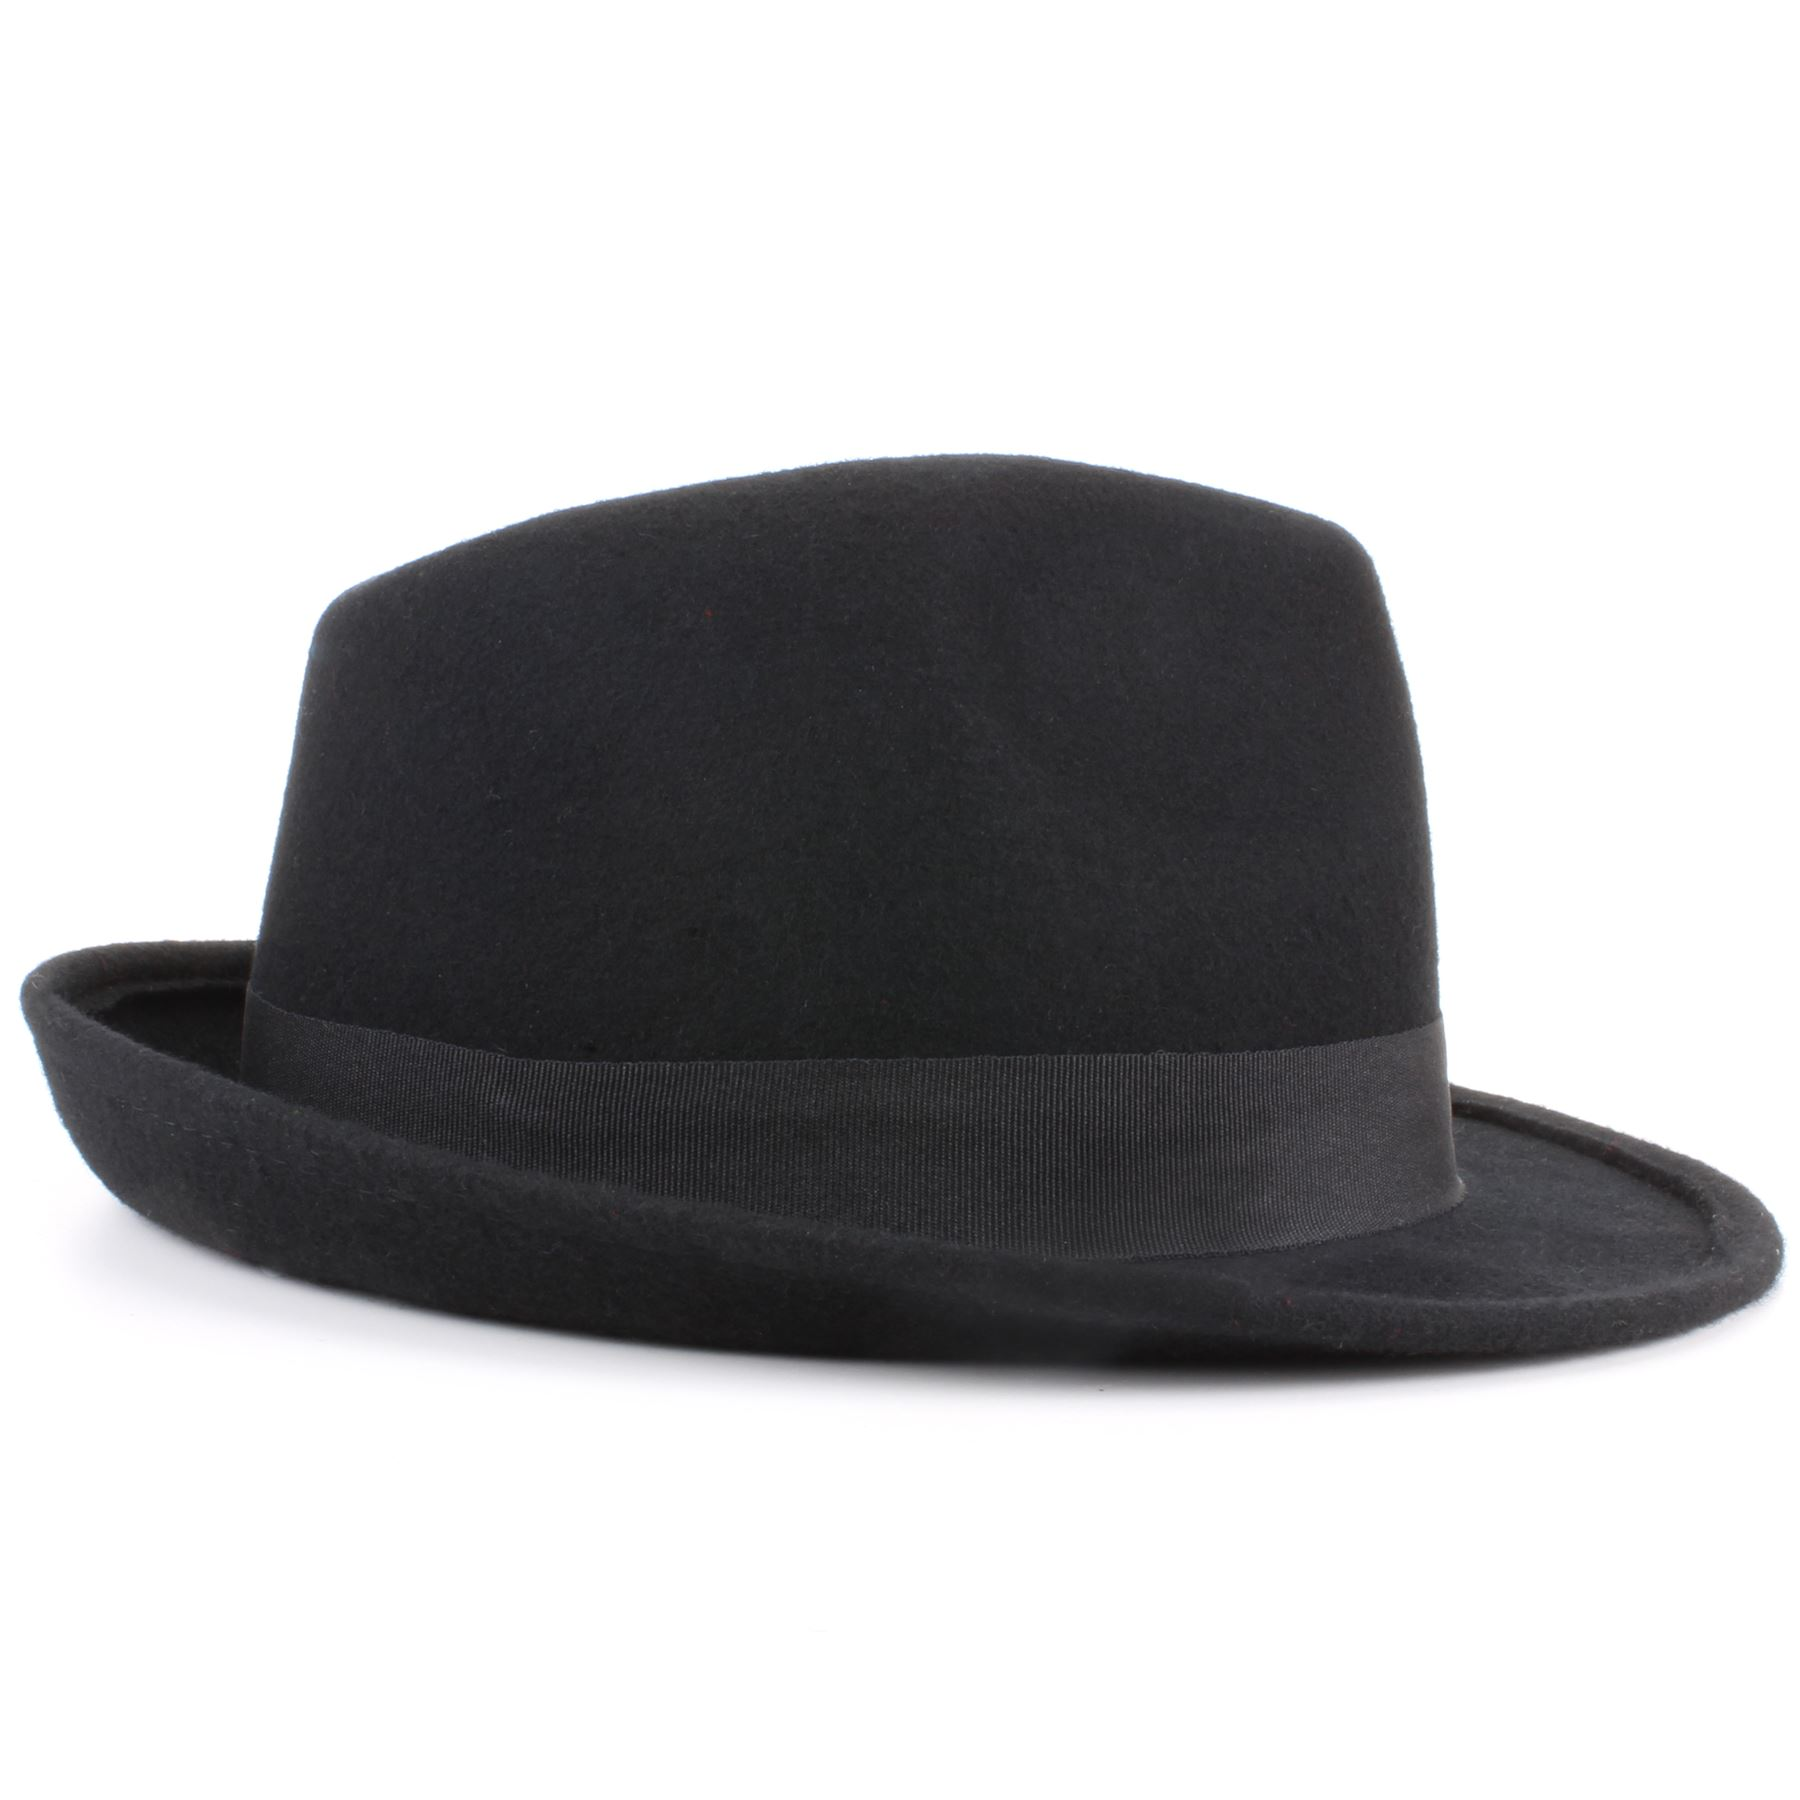 Mens Summer Fedora Hat, Poly braid Bound edge, Crushable Porkpie Hat EPf